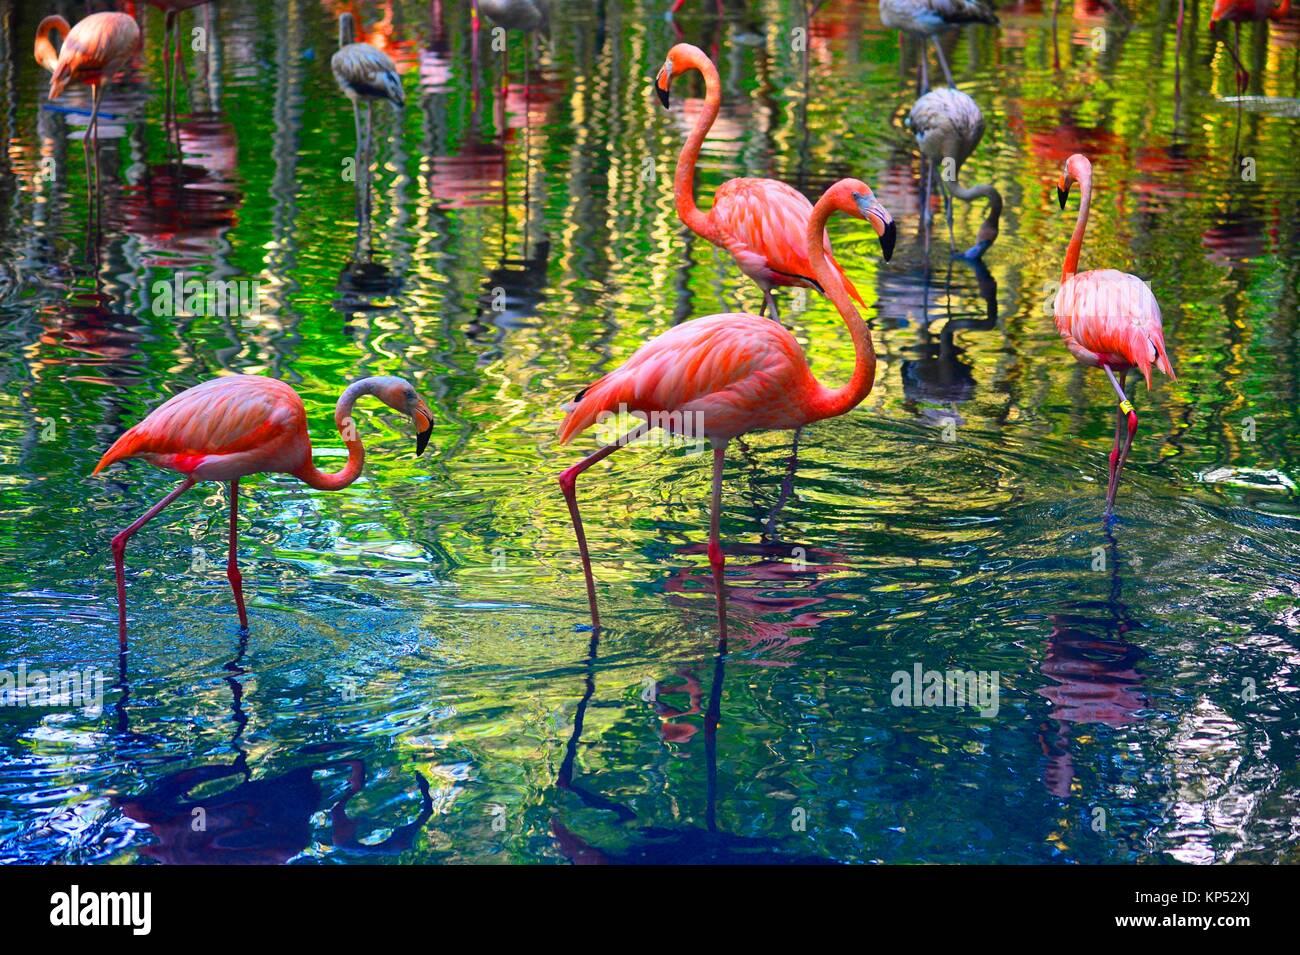 Amerikanische Flamingo, Aviario National de Colombia, Isla Baru, Kolumbien, Südamerika. Stockbild